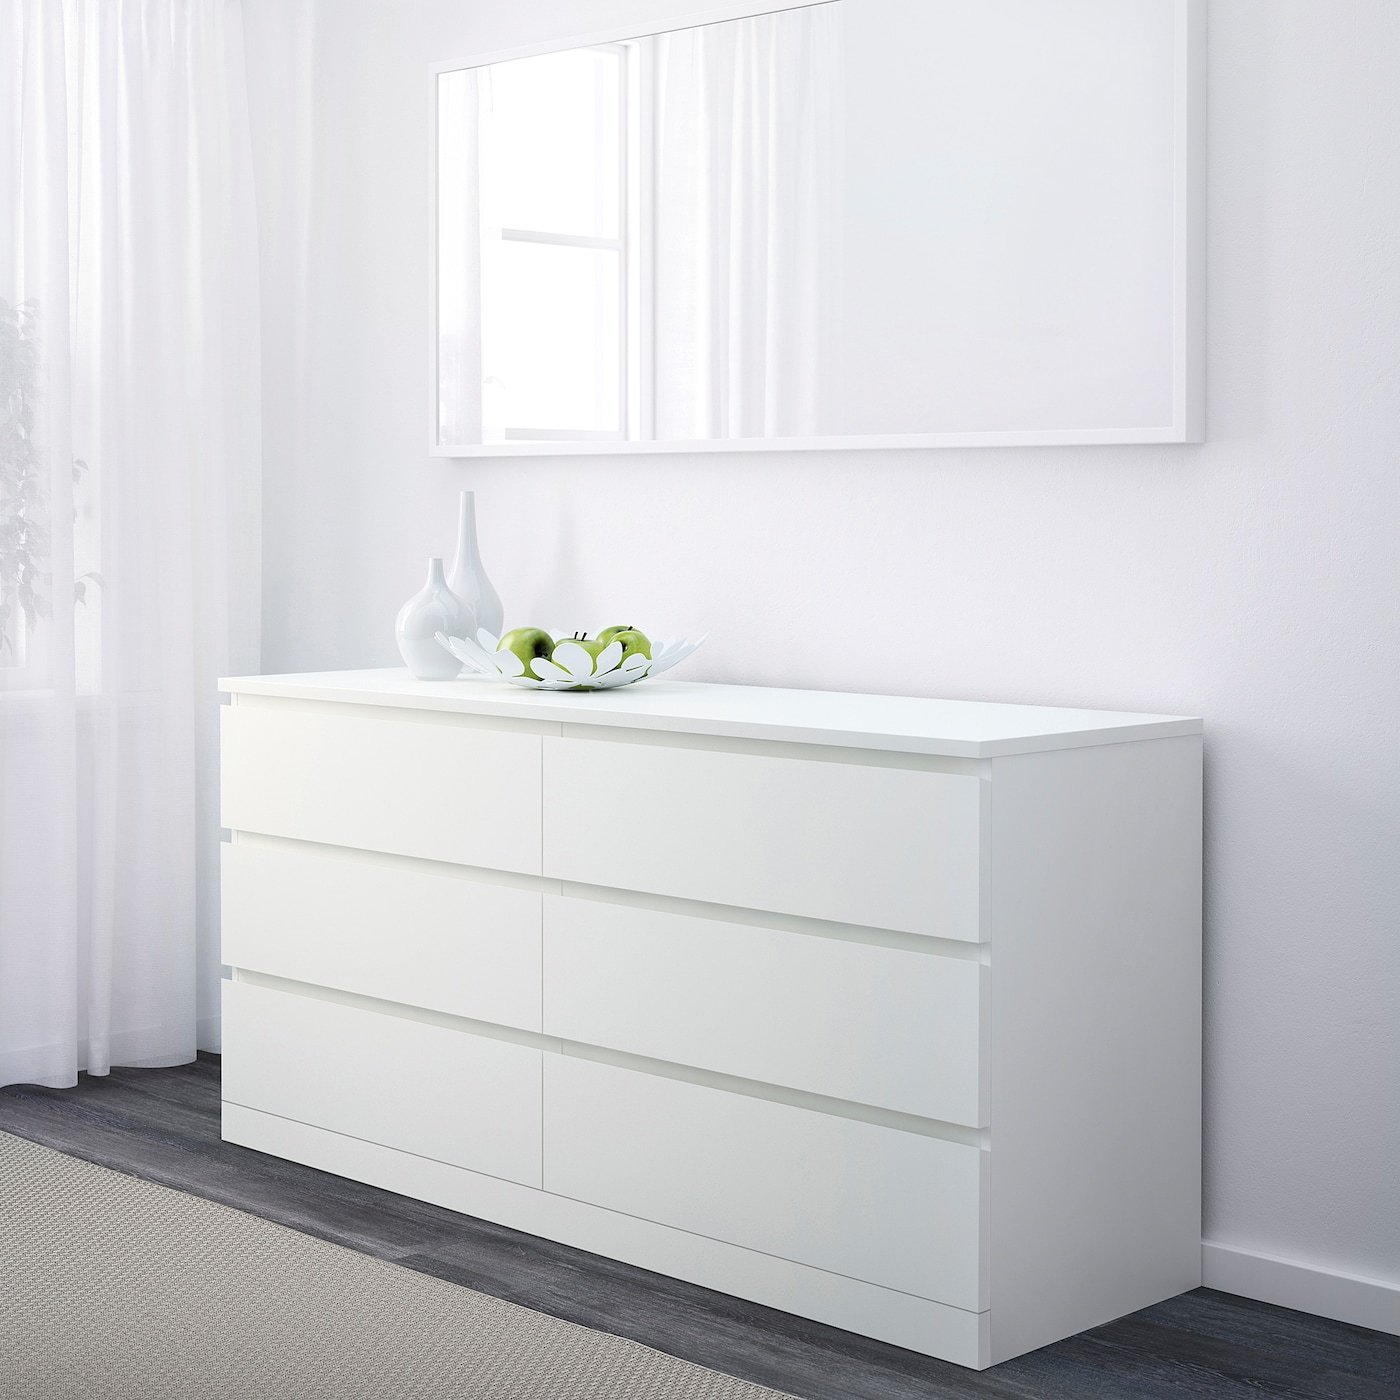 Malm 6 Drawer Dresser White 63x30 3 4